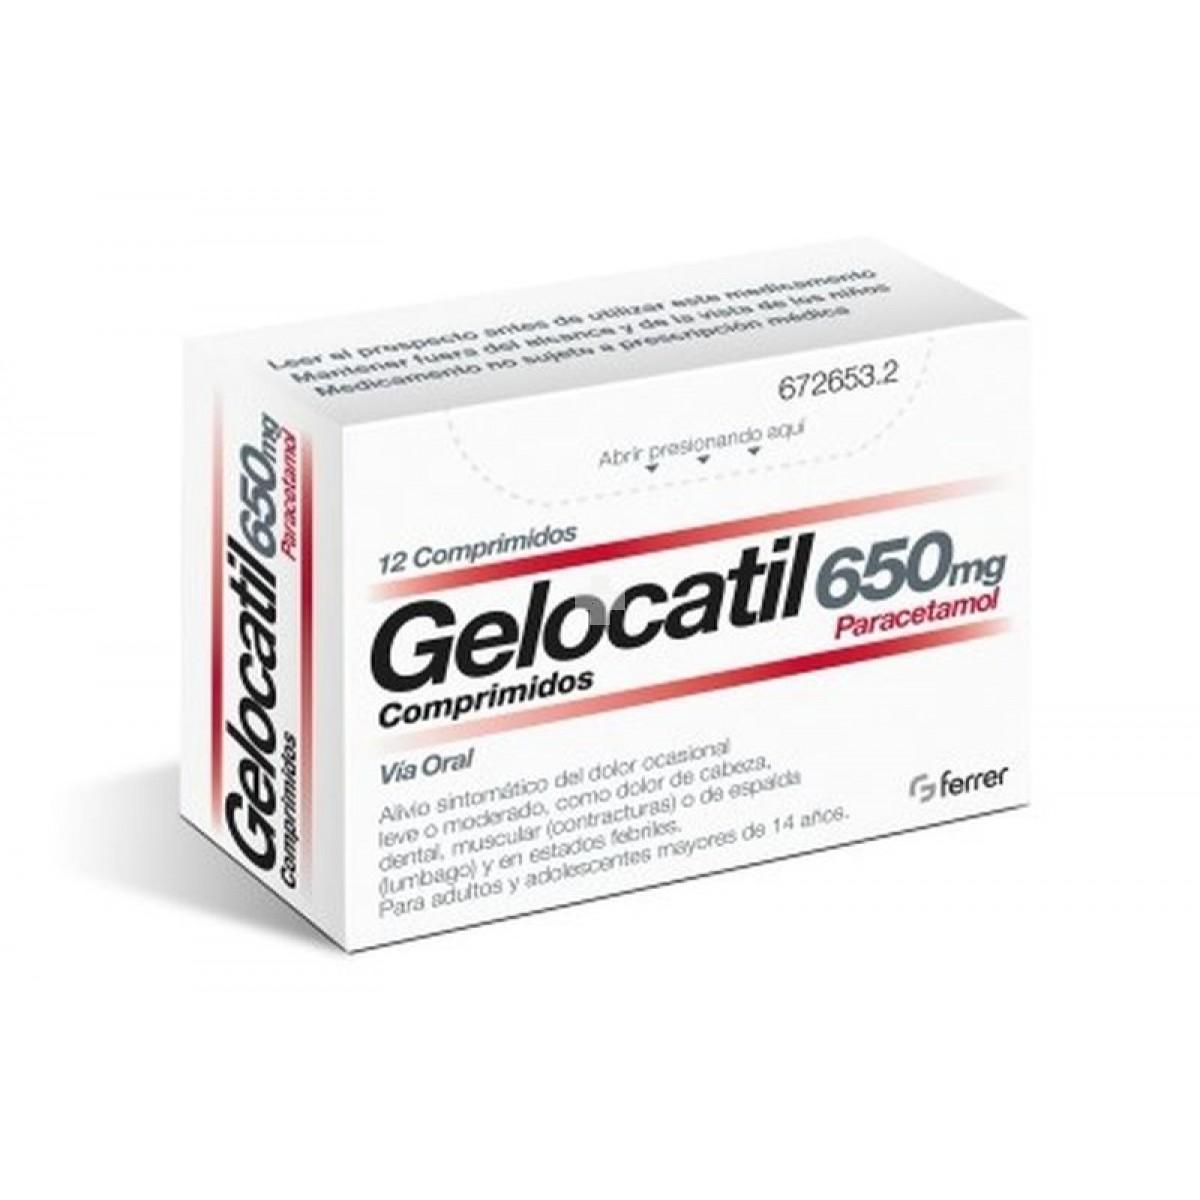 GELOCATIL 650MG – 12 COMPRIMIDOS